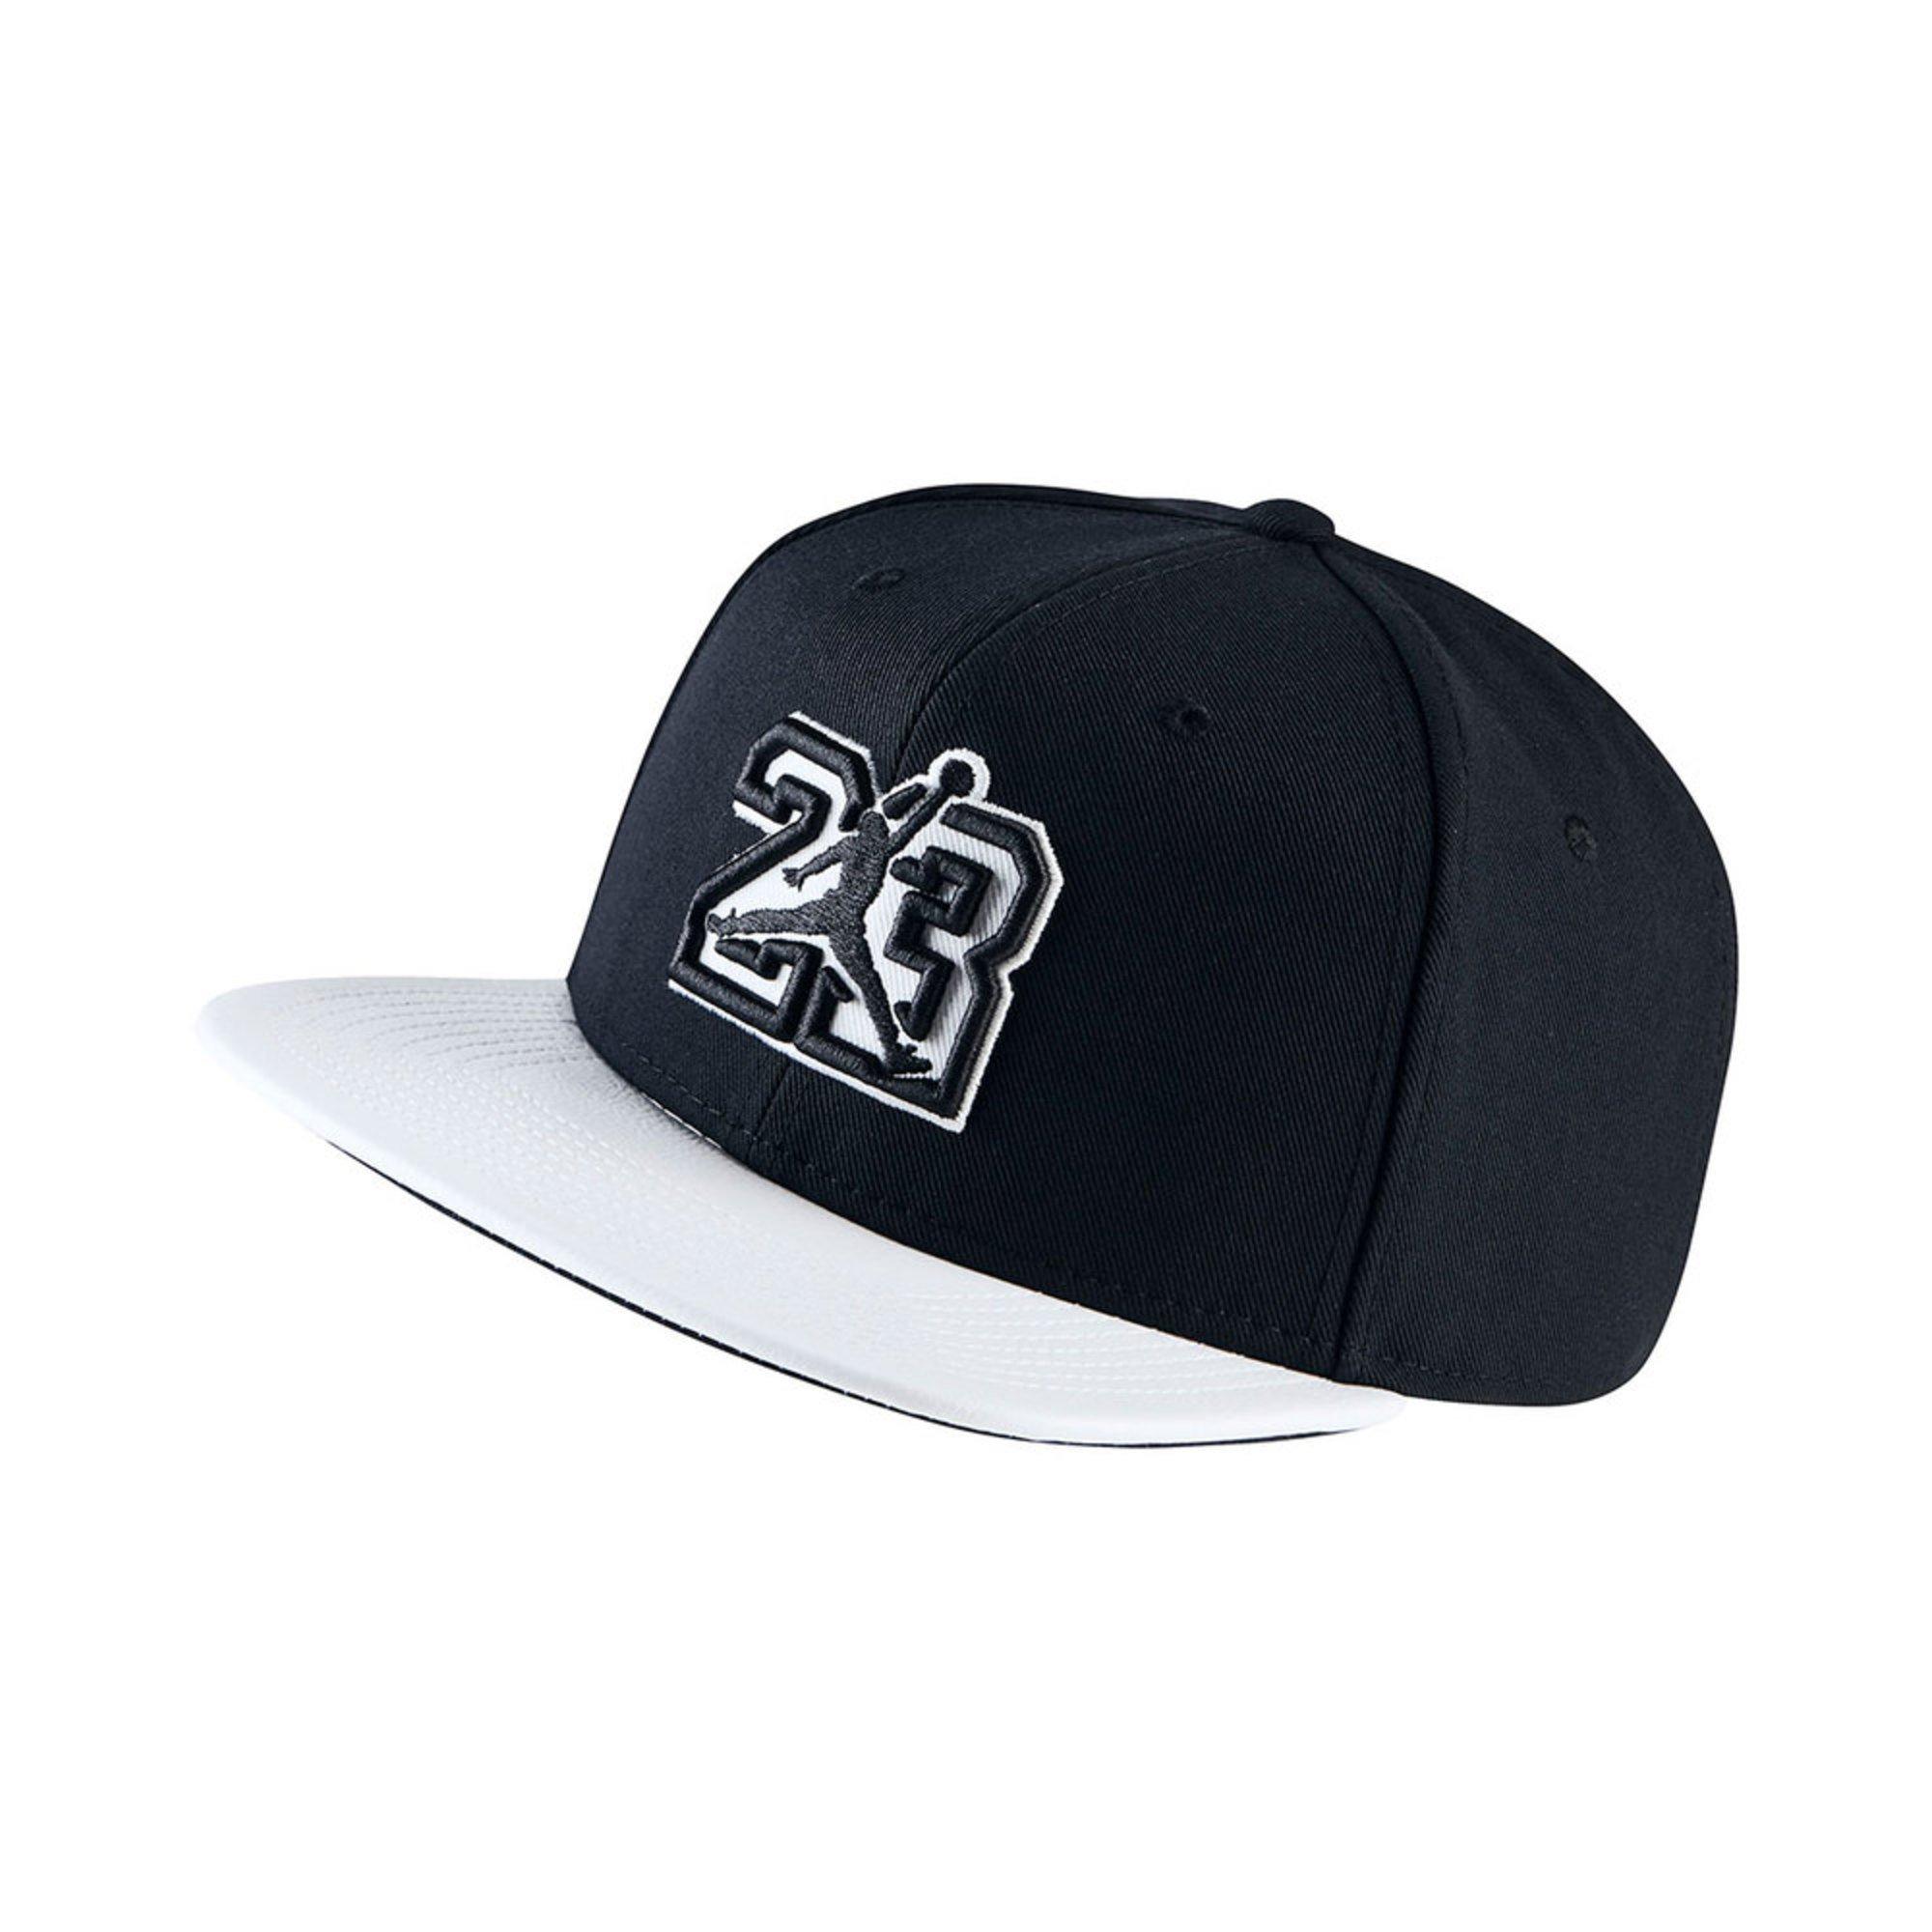 692b36c3ab514f Jordan Men s Pro Hgg Xiii Hat